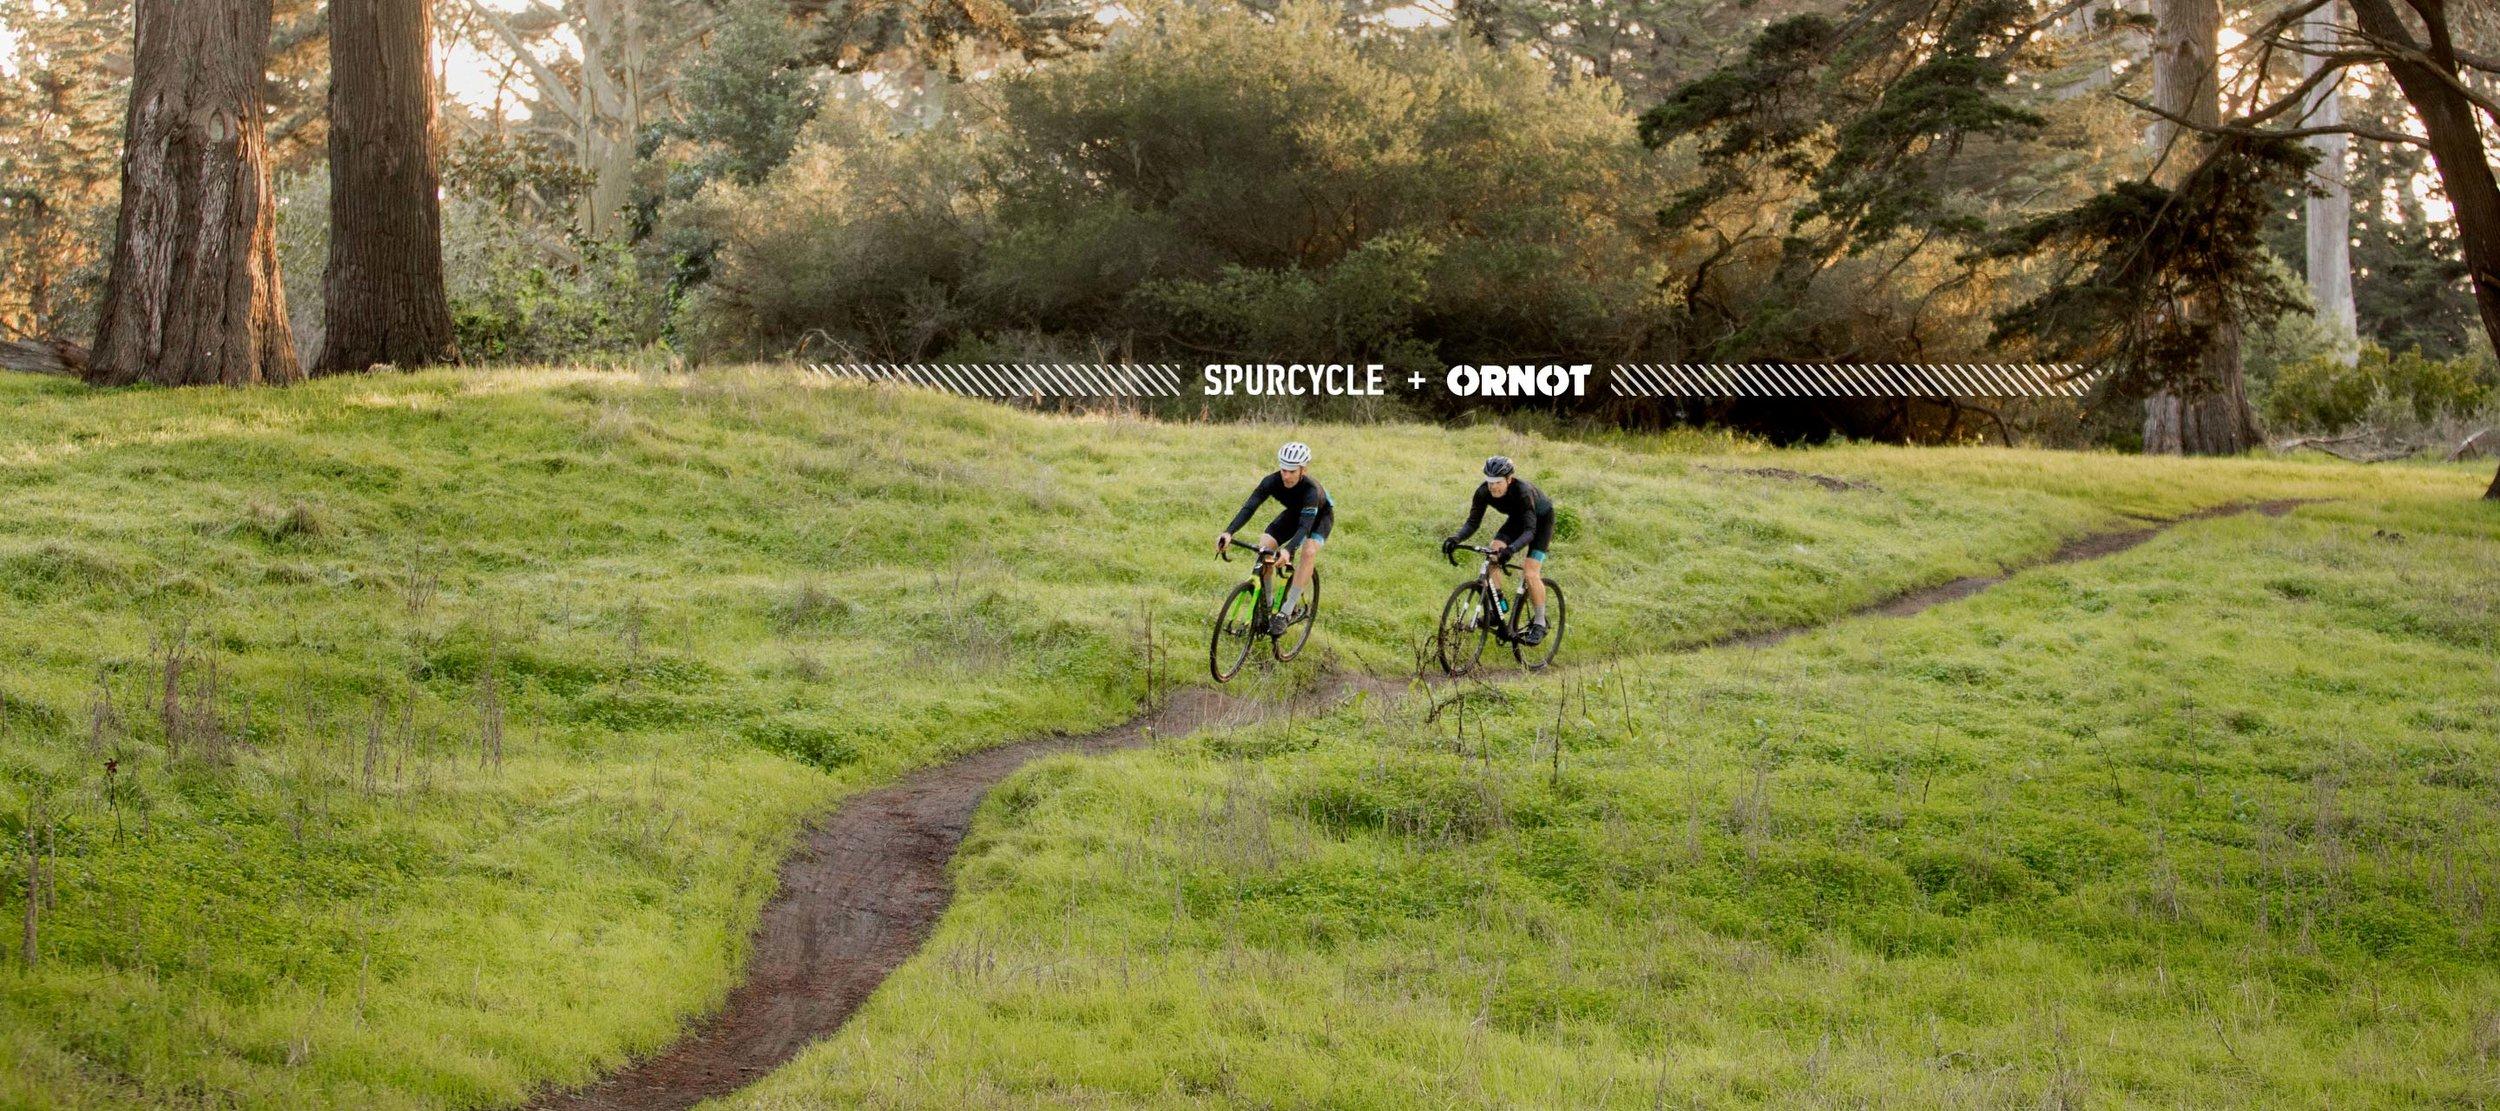 spurcycle-ornot-hero.jpg